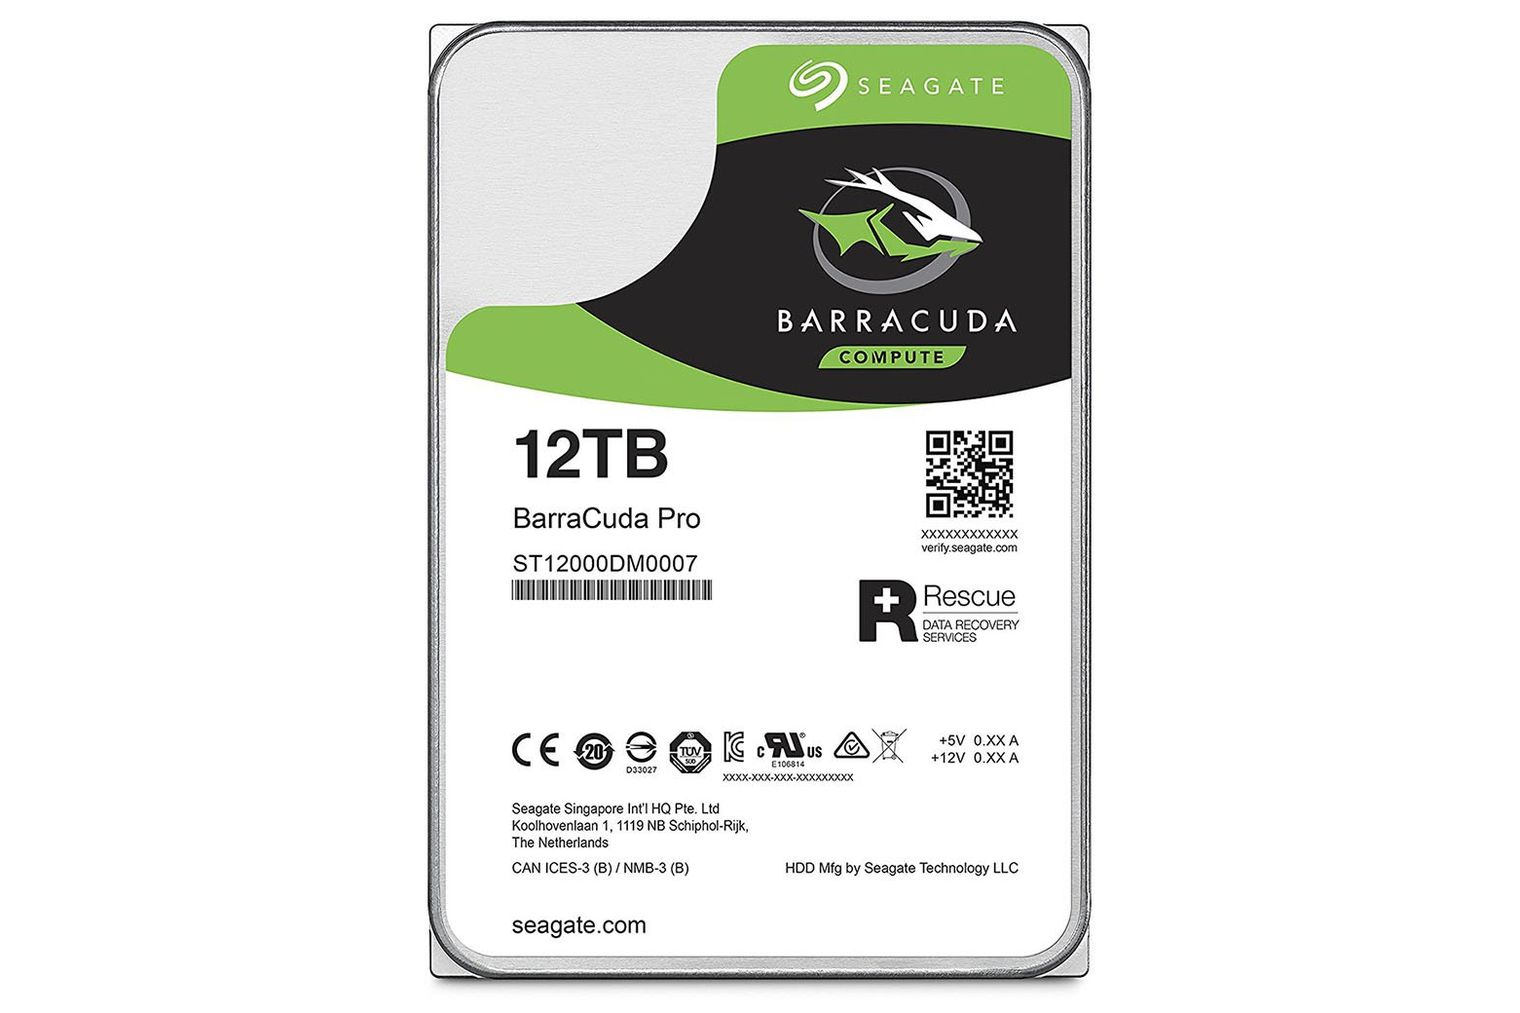 seagate_barracuda_pro_12TB